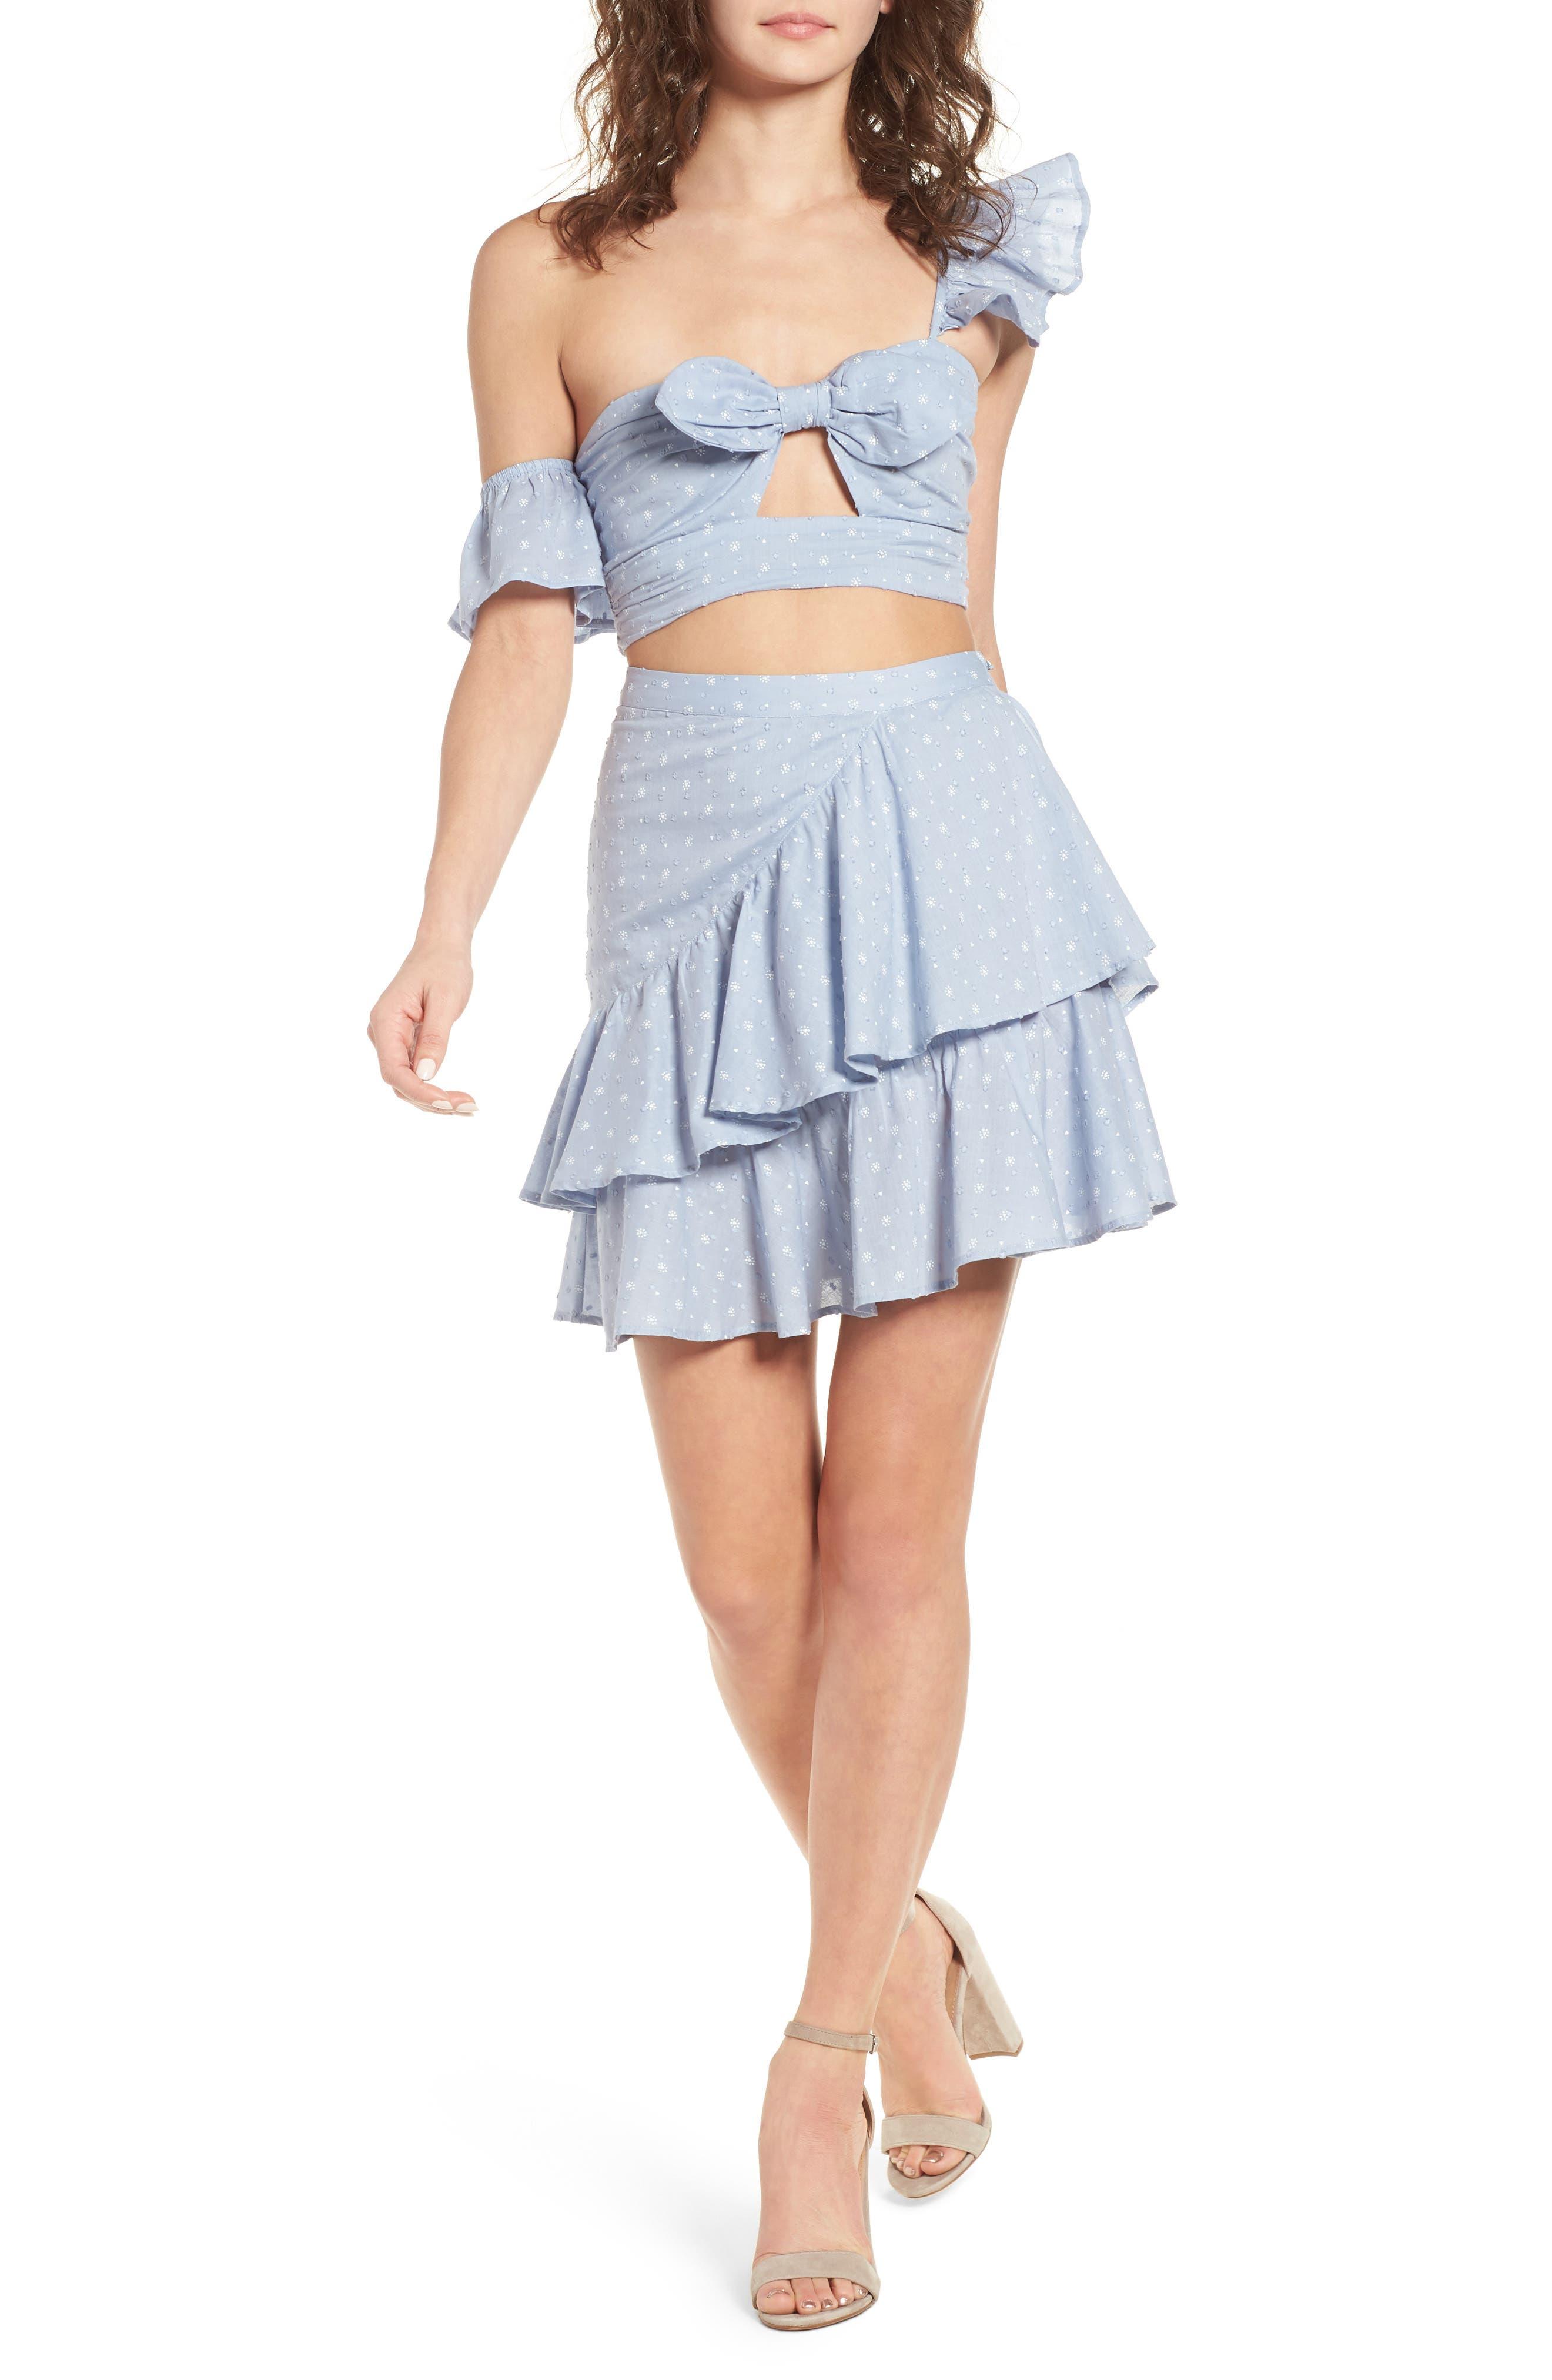 Mara Ruffled Miniskirt,                             Alternate thumbnail 2, color,                             Sail Blue